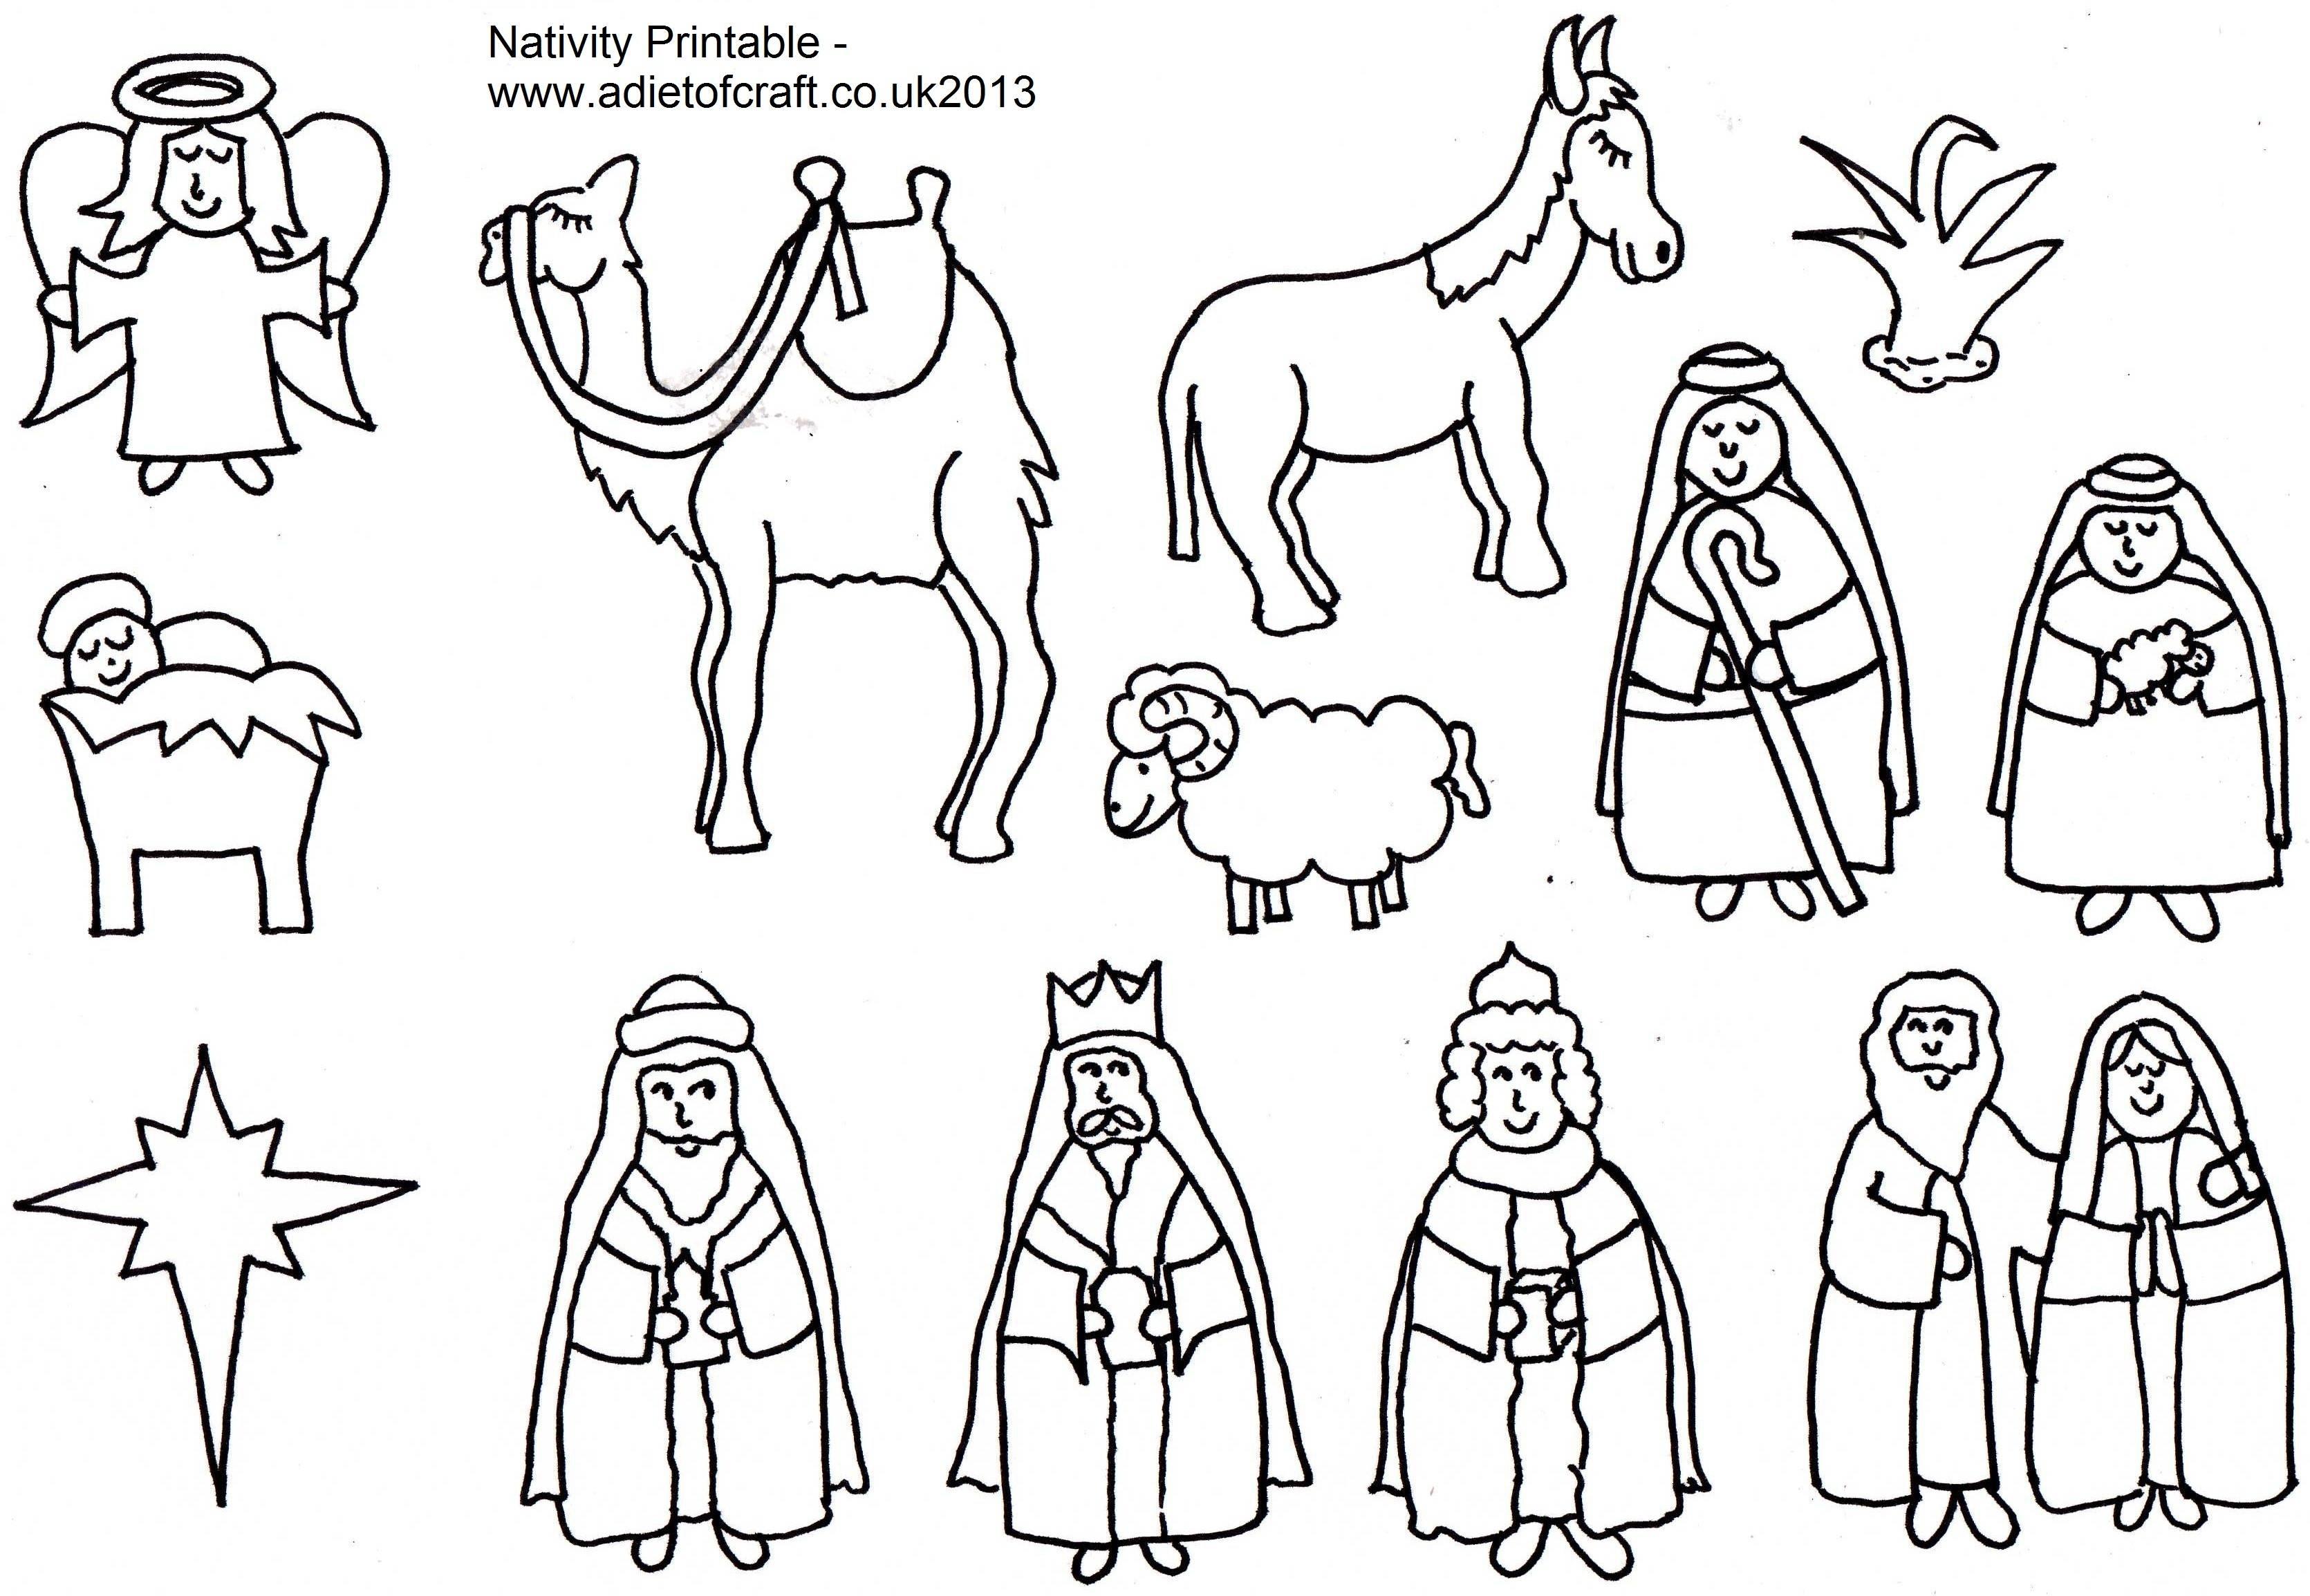 Nativity Scene Character Templates